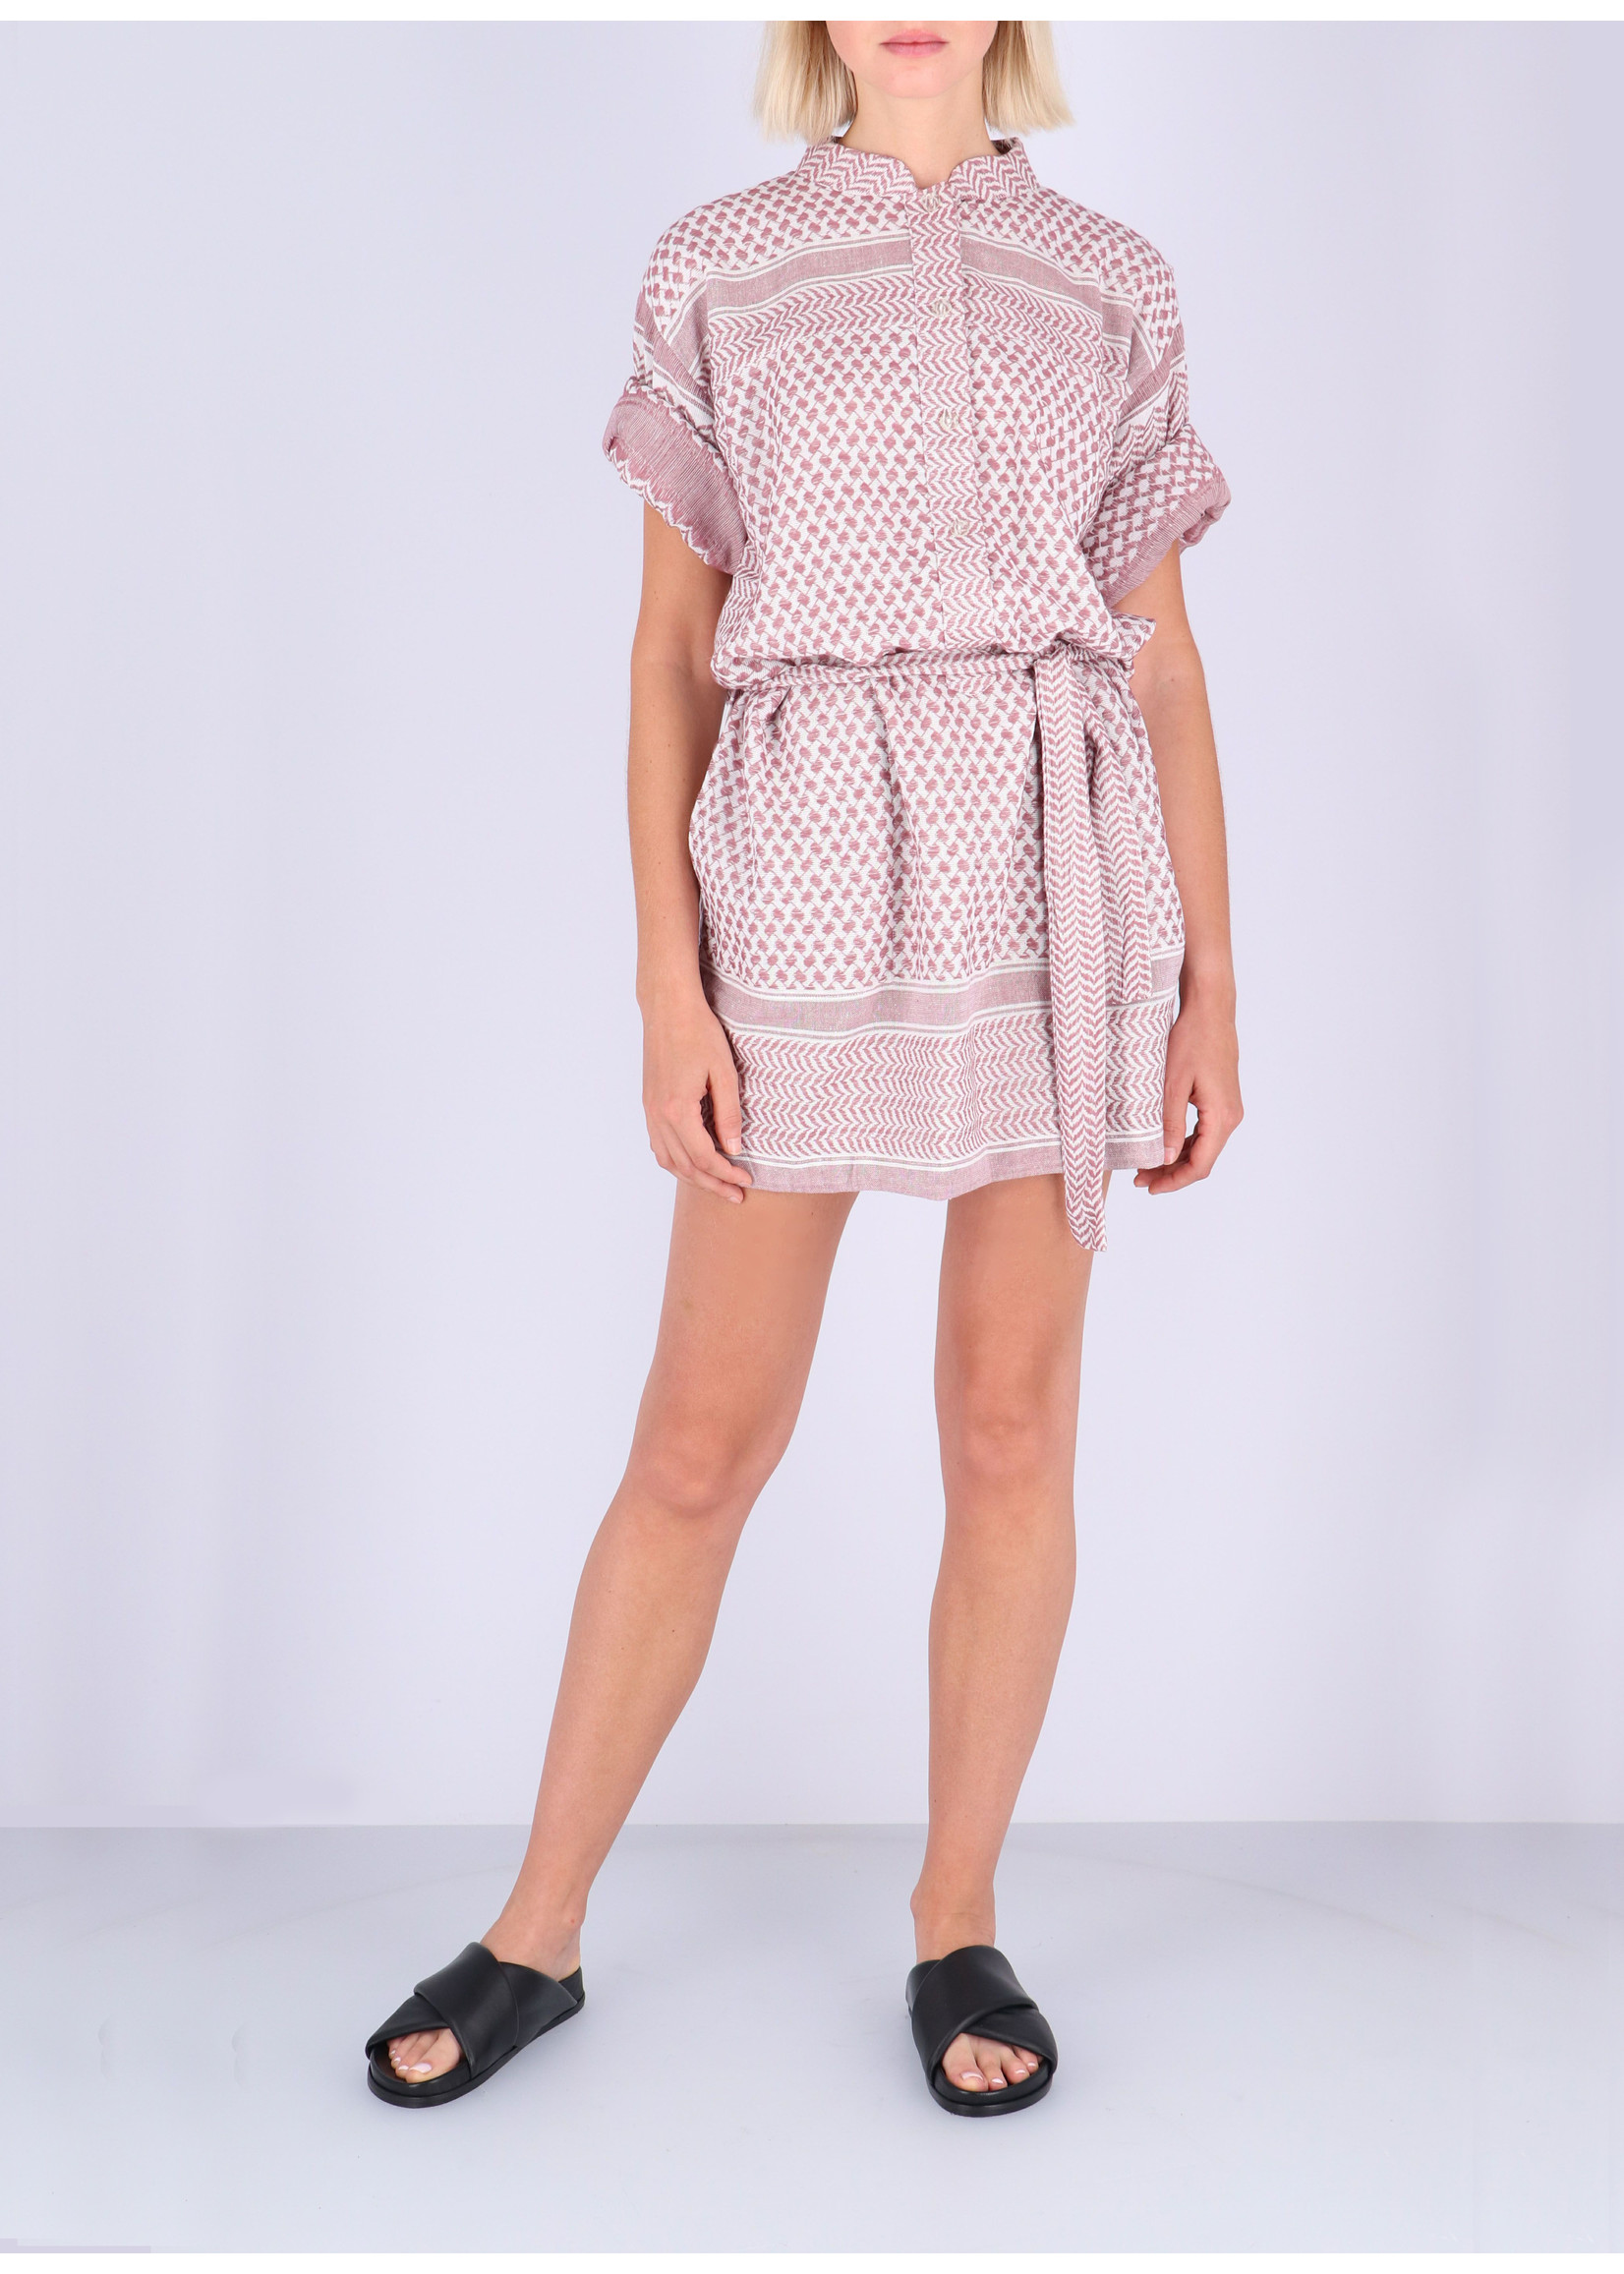 Rough Studios Leila K. Dress pink/white